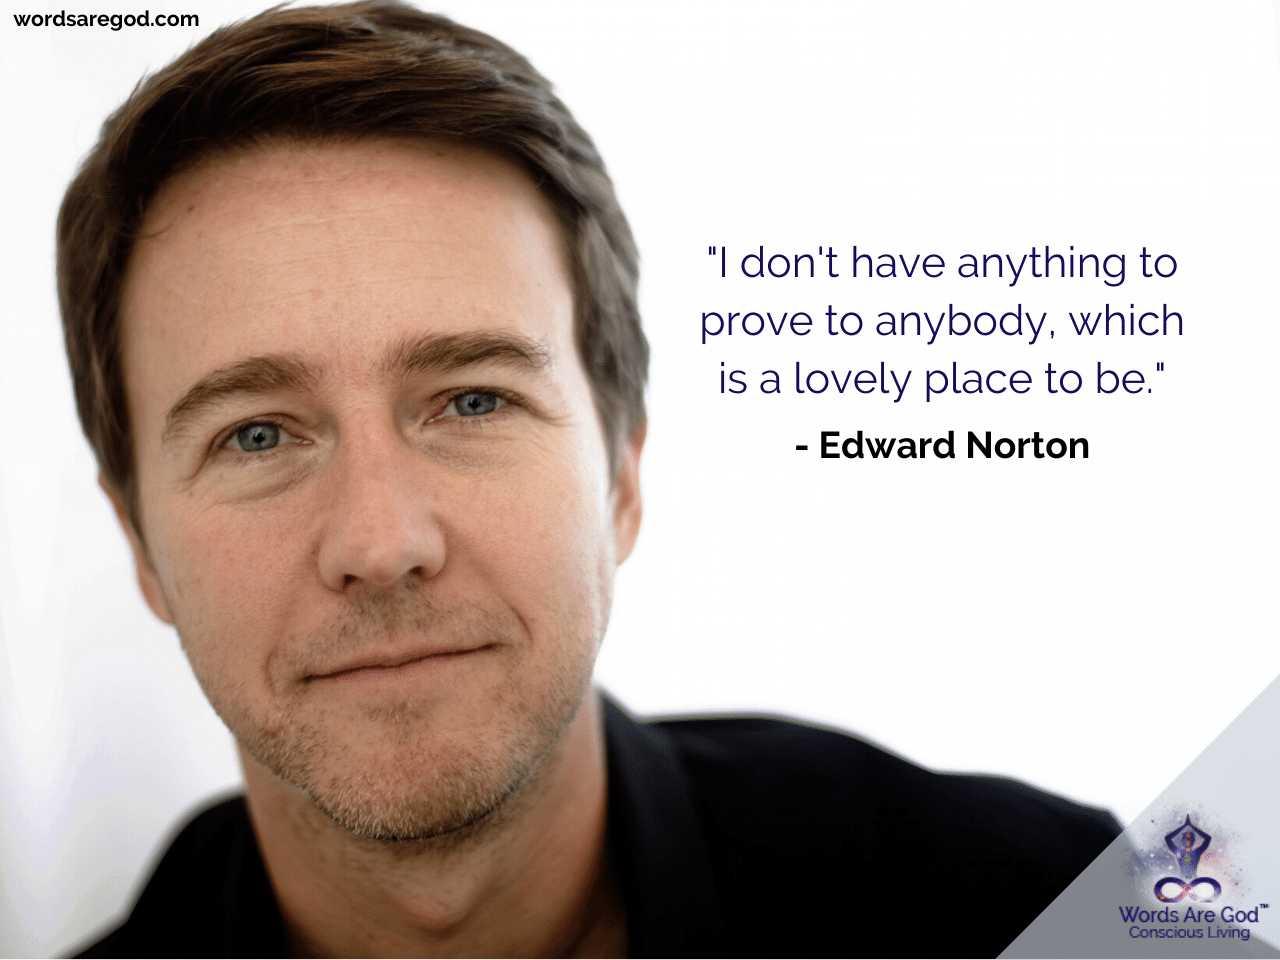 Edward Norton Inspirational Quotes by Edward Norton